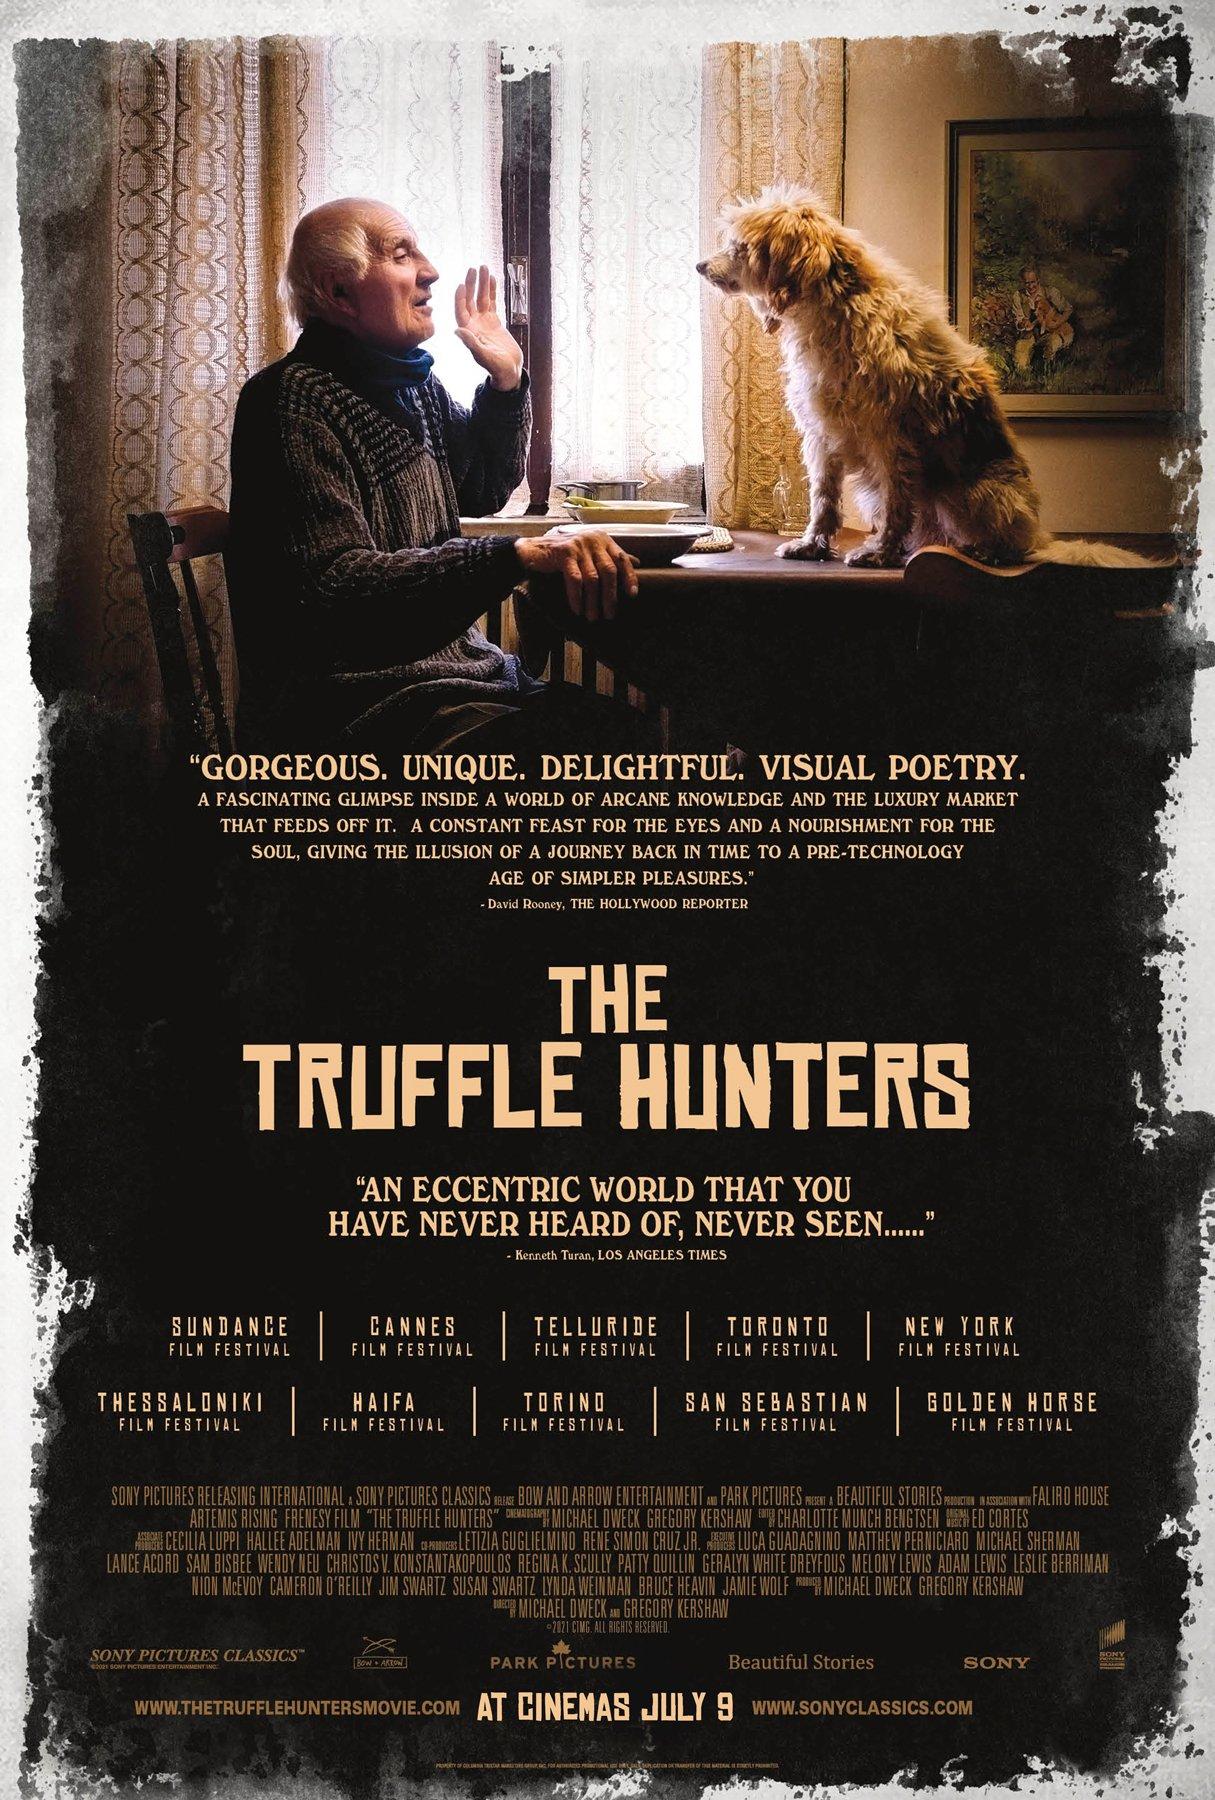 The Truffle Hunters – UK 1 sheetposter